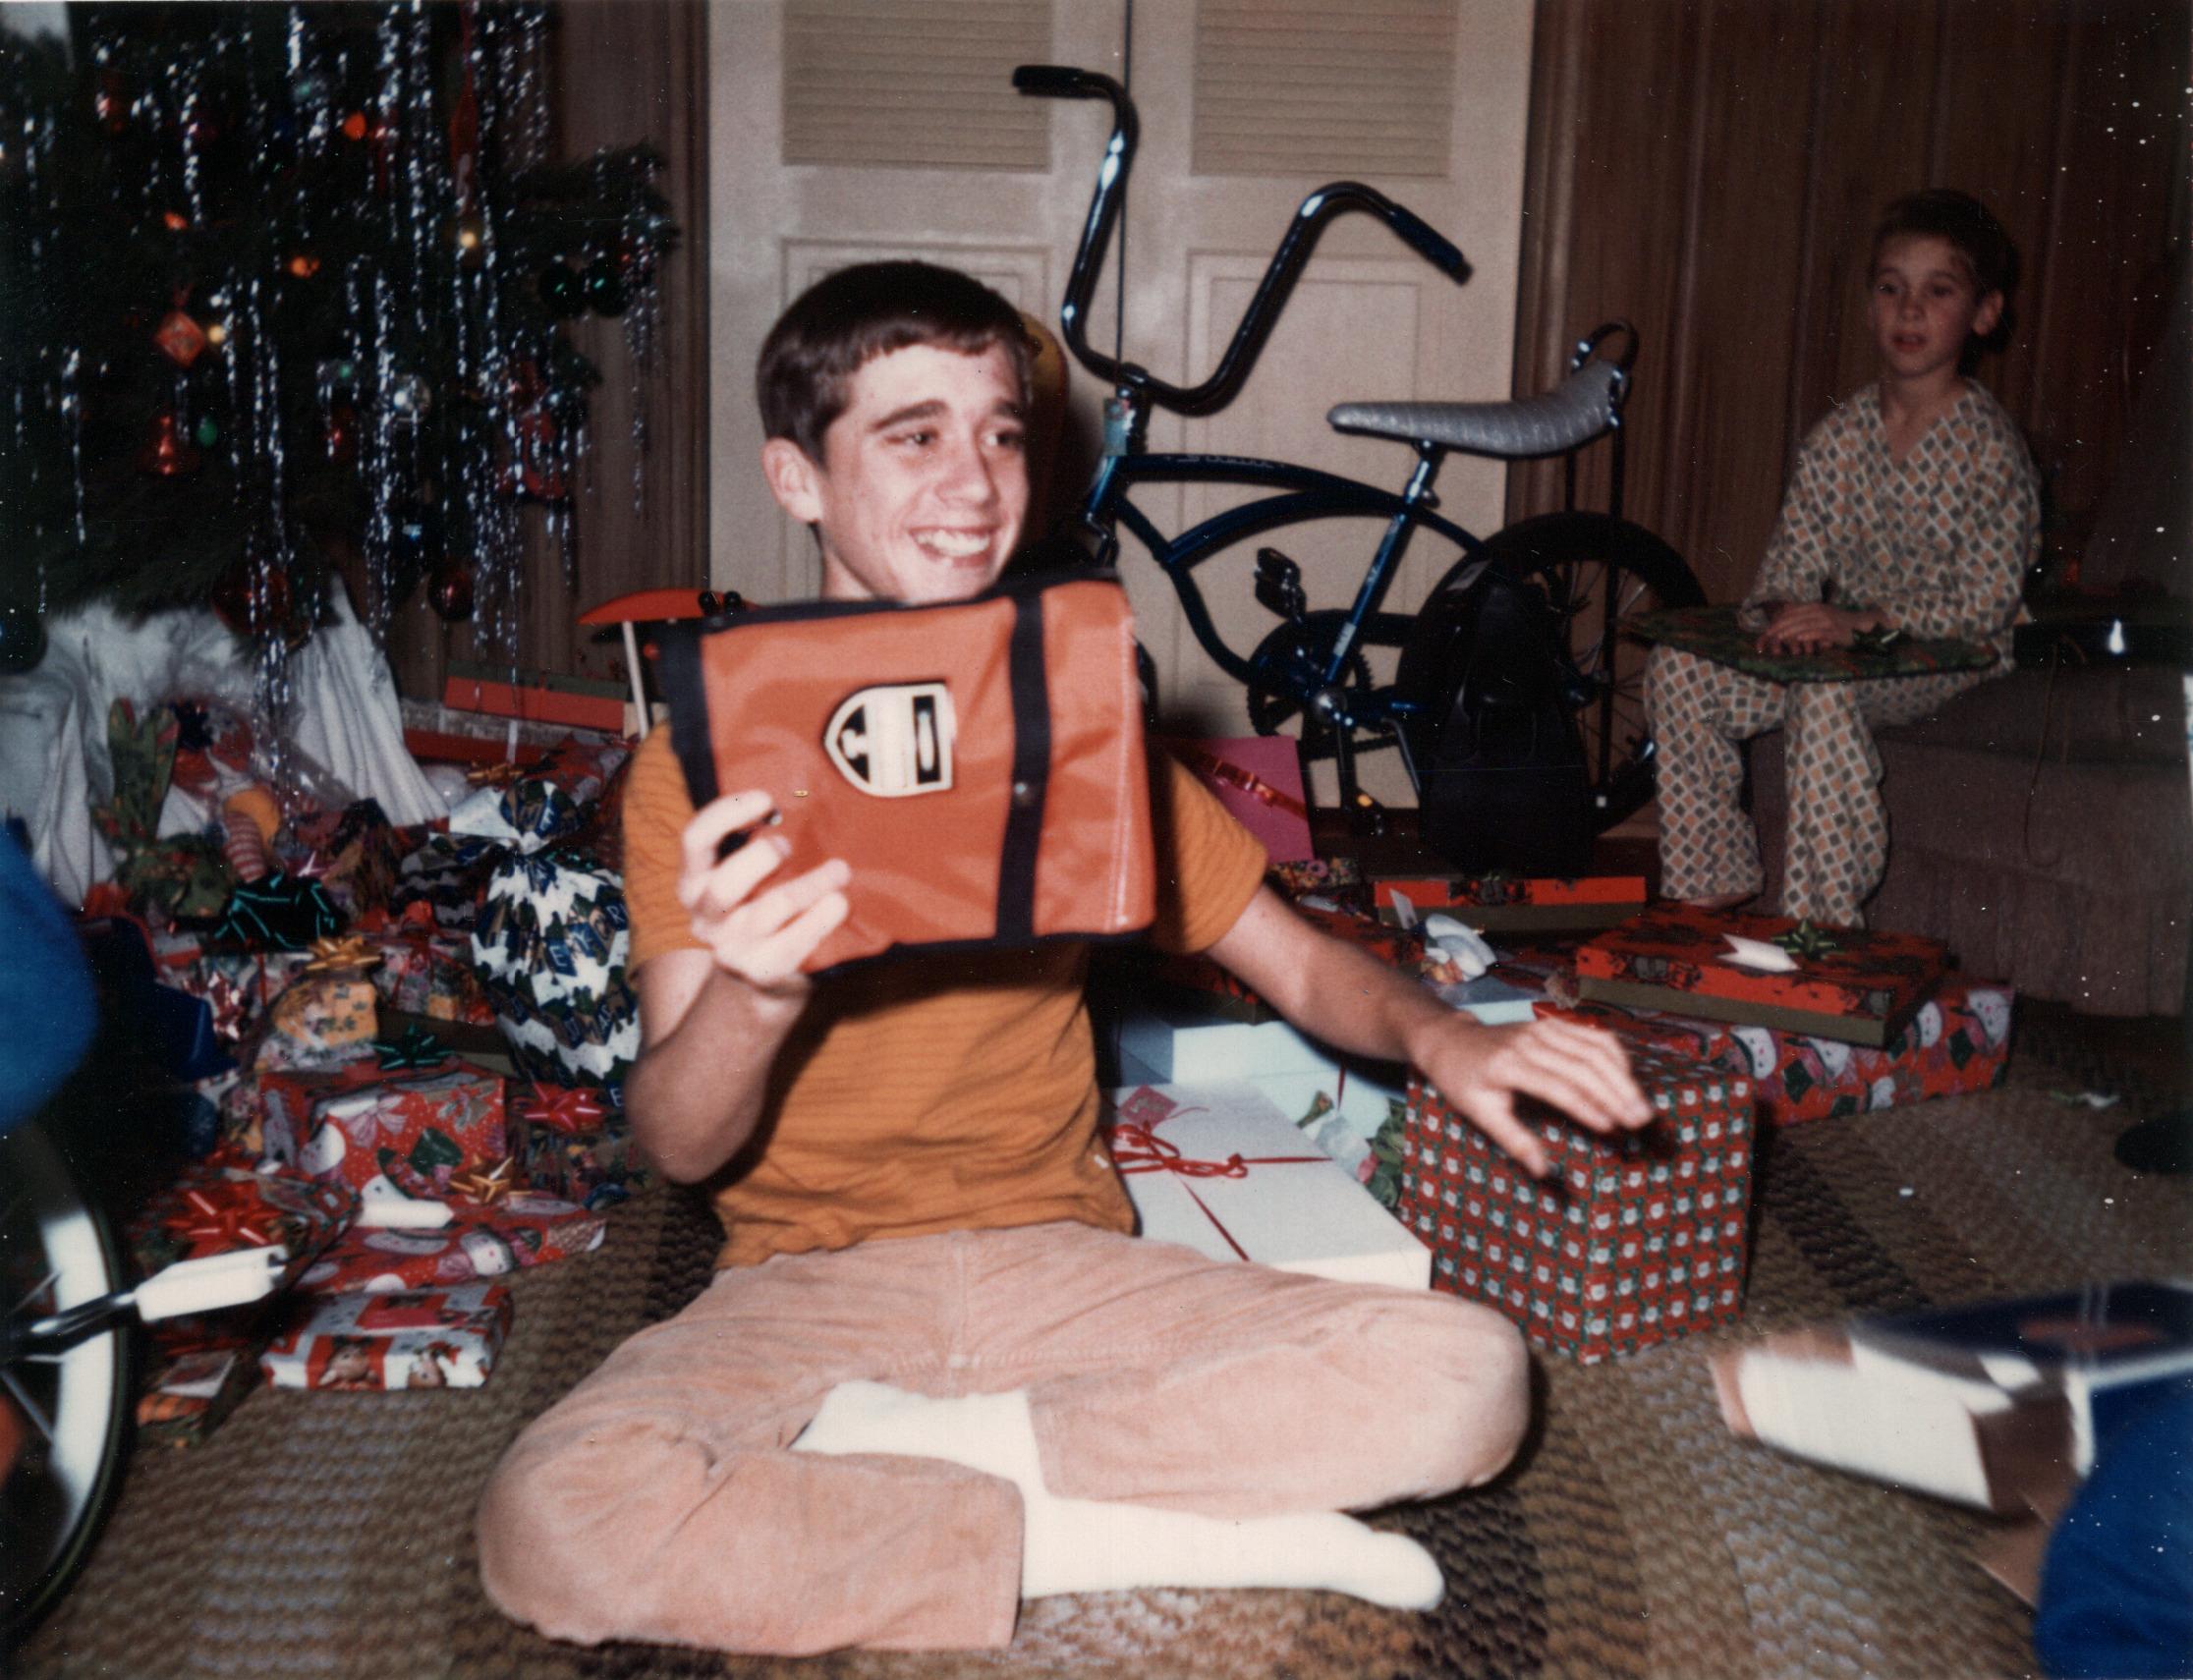 Buddy & Roger at Christmas